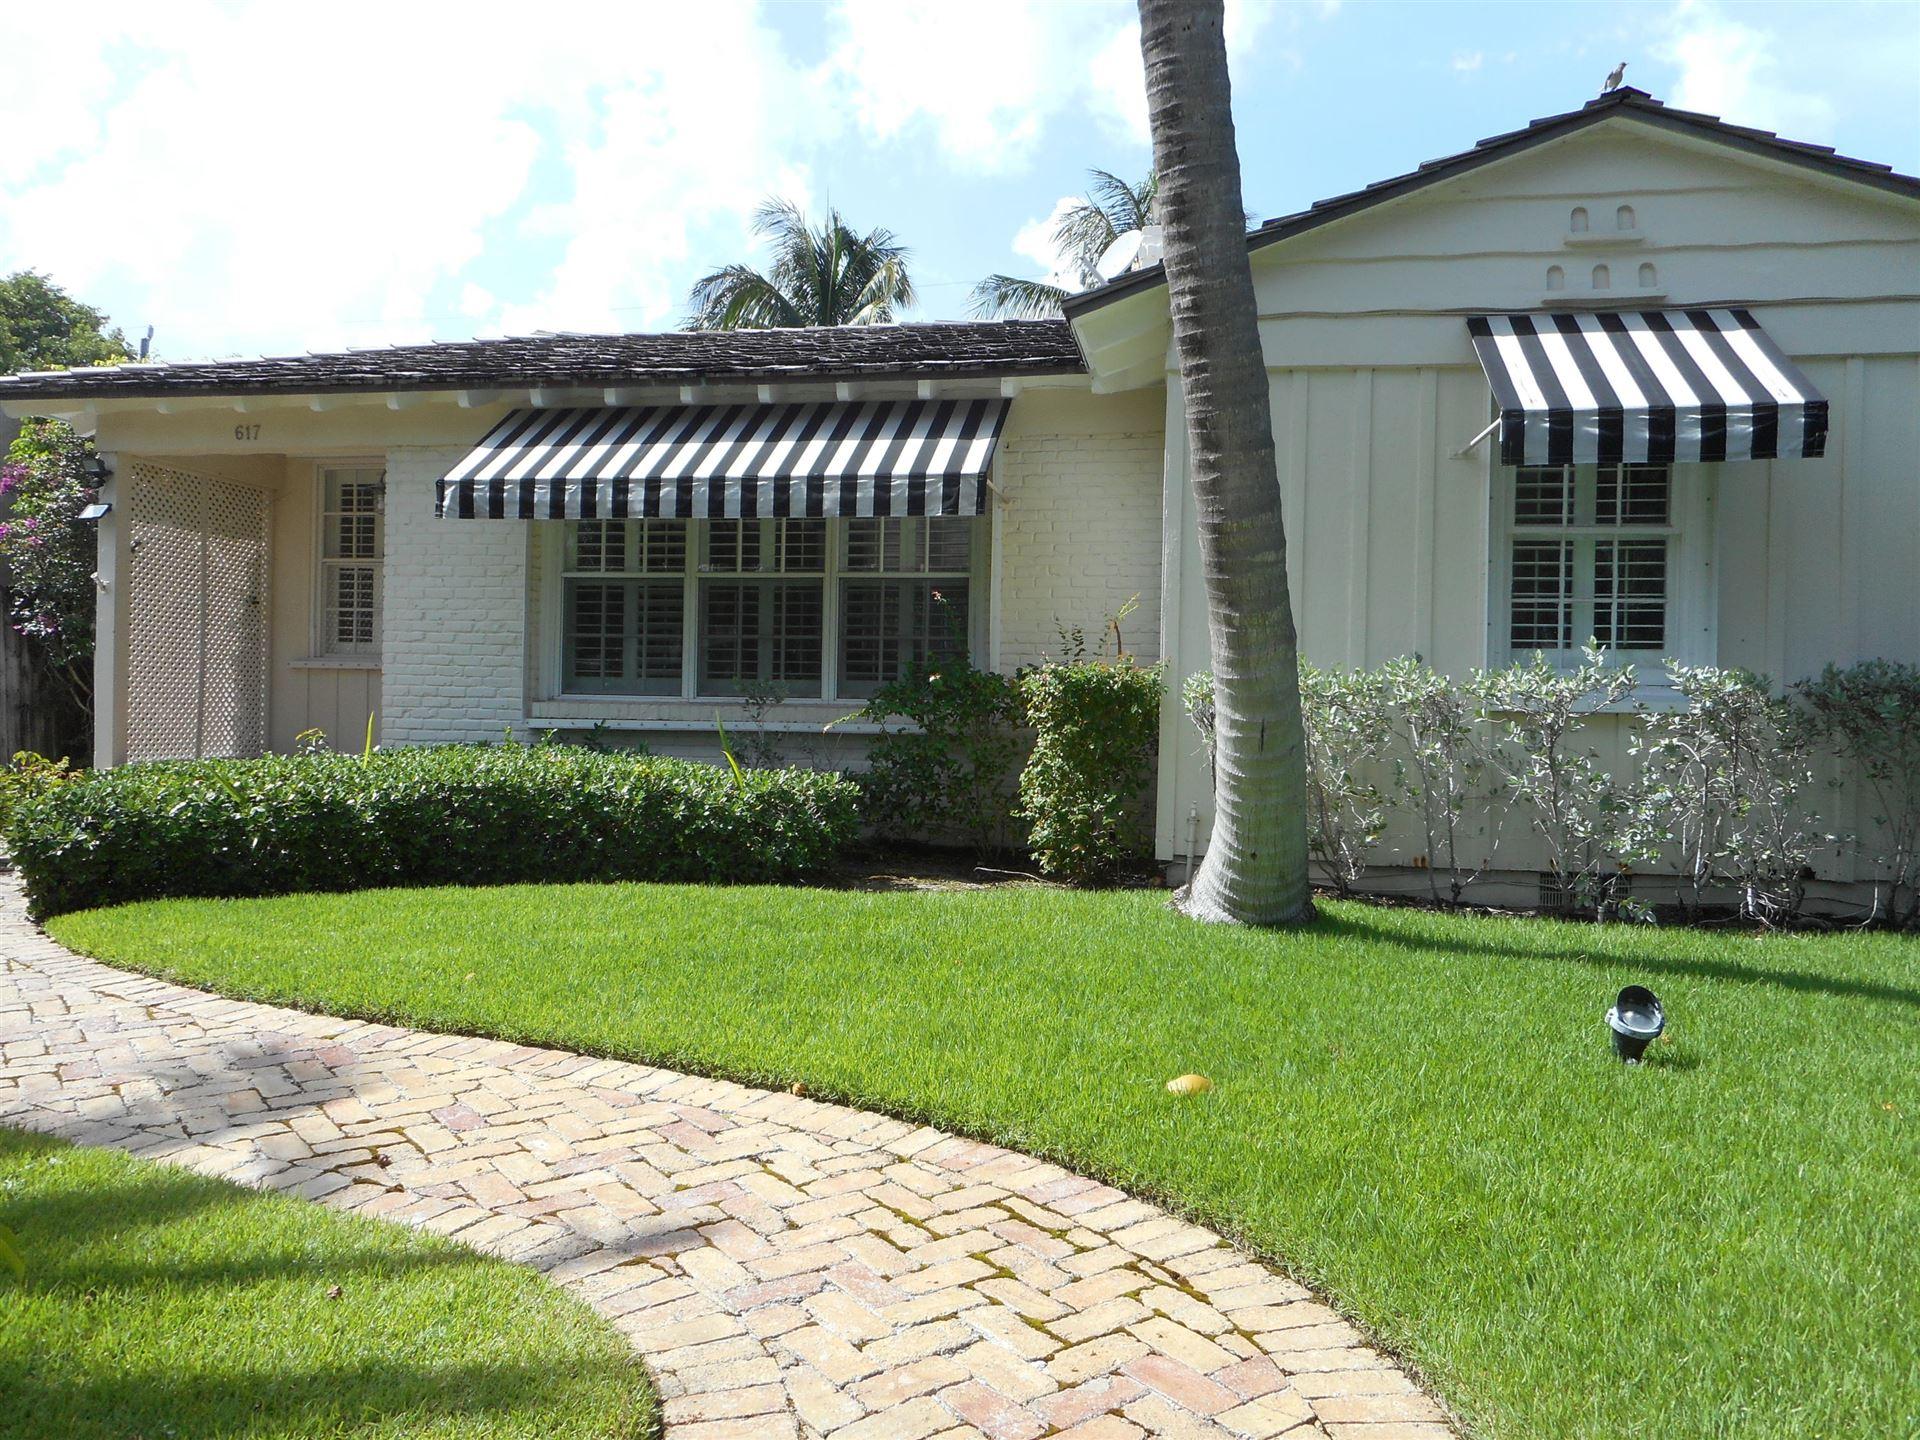 617 Ardmore Road, West Palm Beach, FL 33401 - #: RX-10636108